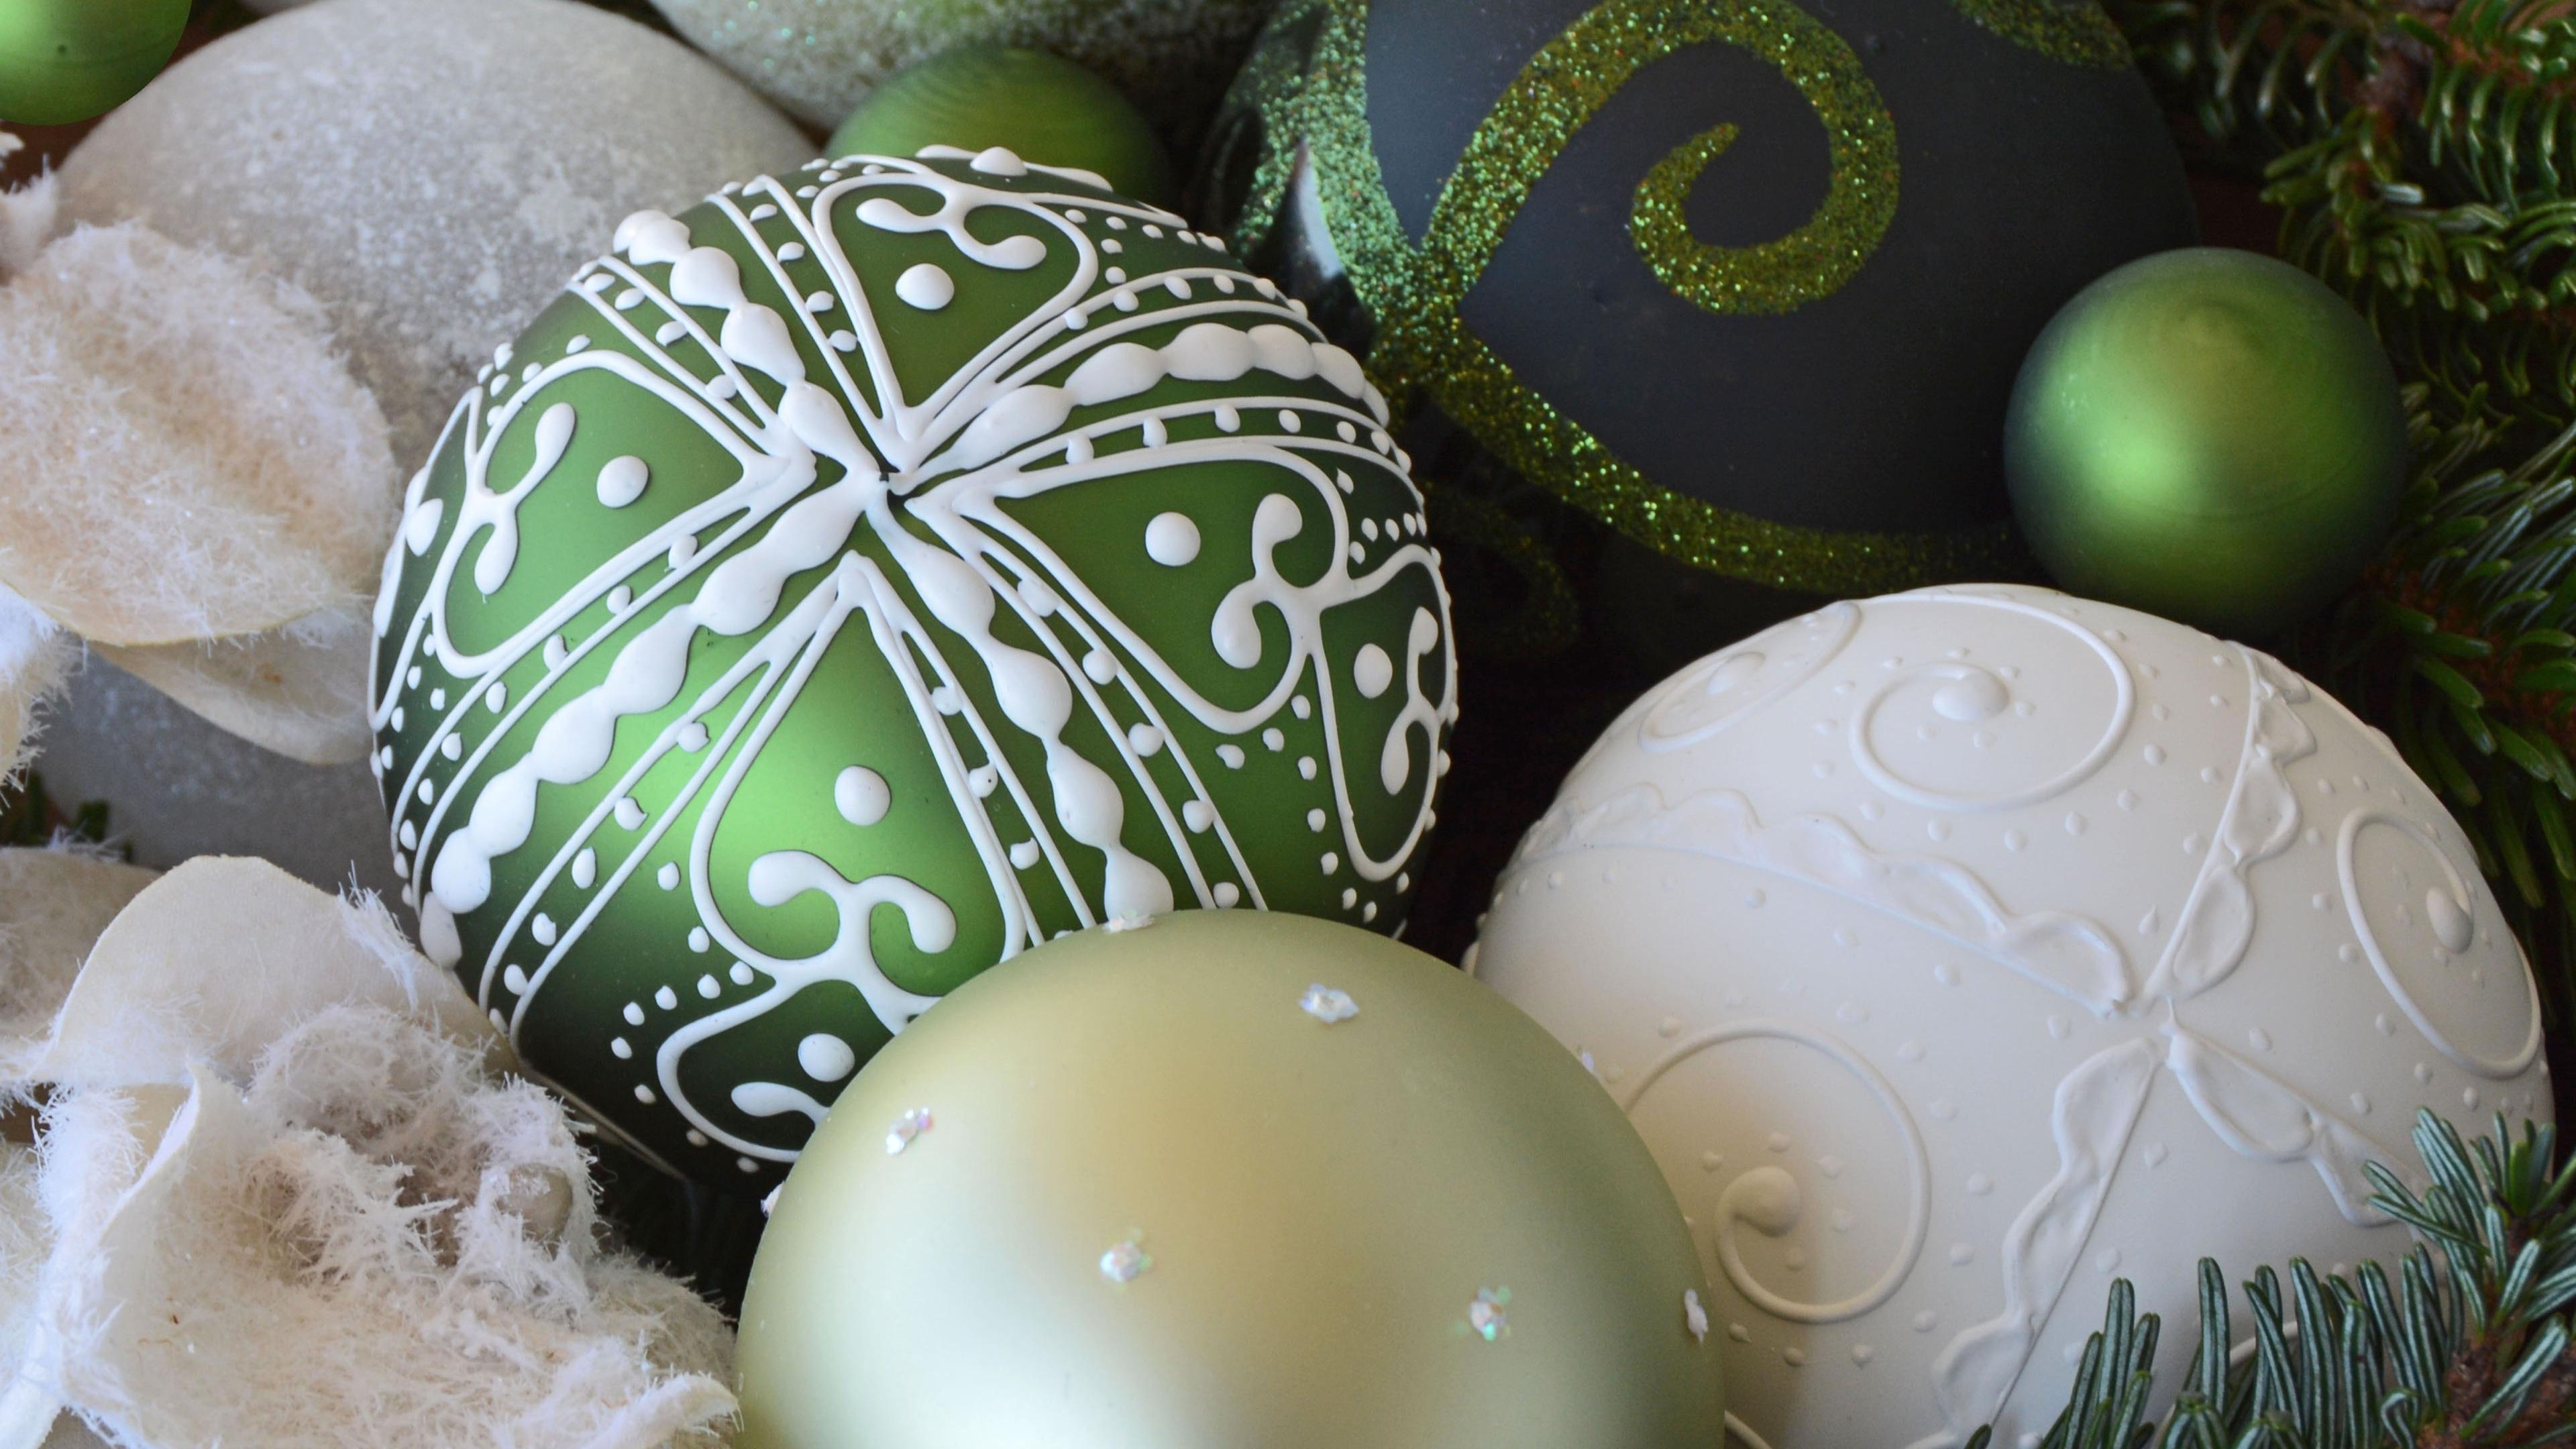 christmas decorations christmas balls new year 4k 1538345187 - christmas decorations, christmas balls, new year 4k - new year, christmas decorations, christmas balls